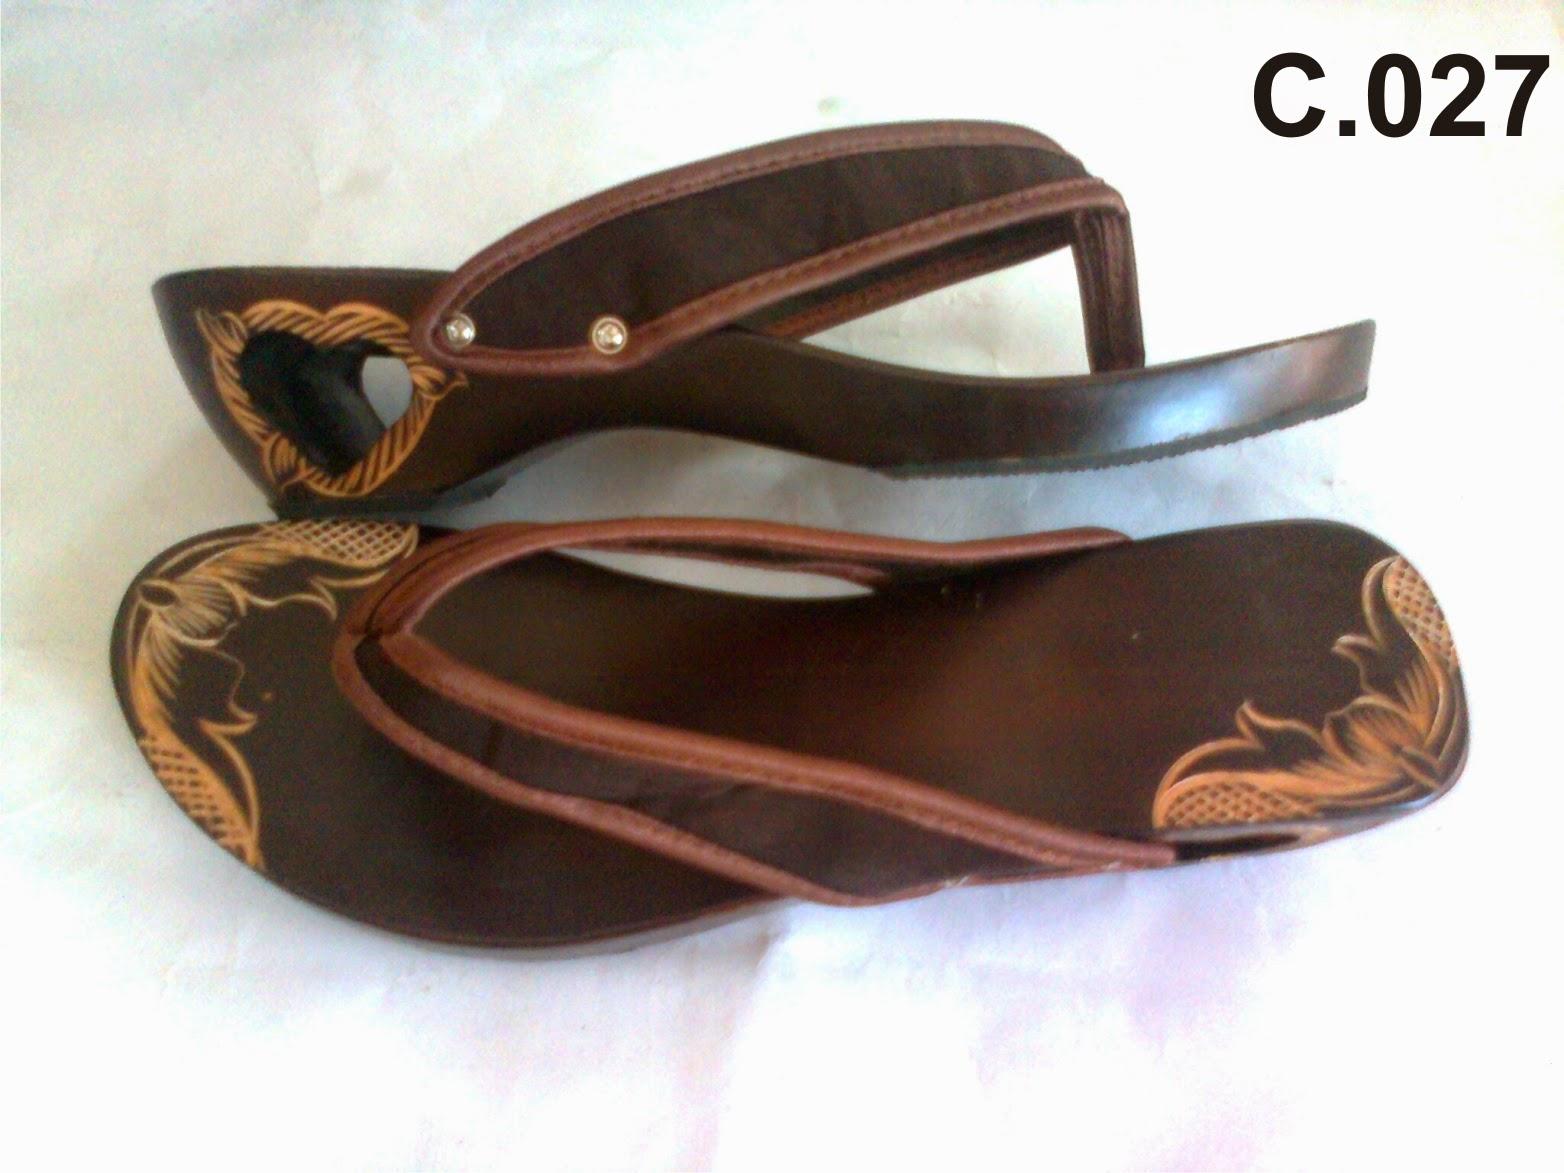 Sandal Wanita Branded Kelom Geulis Tasikmalaya